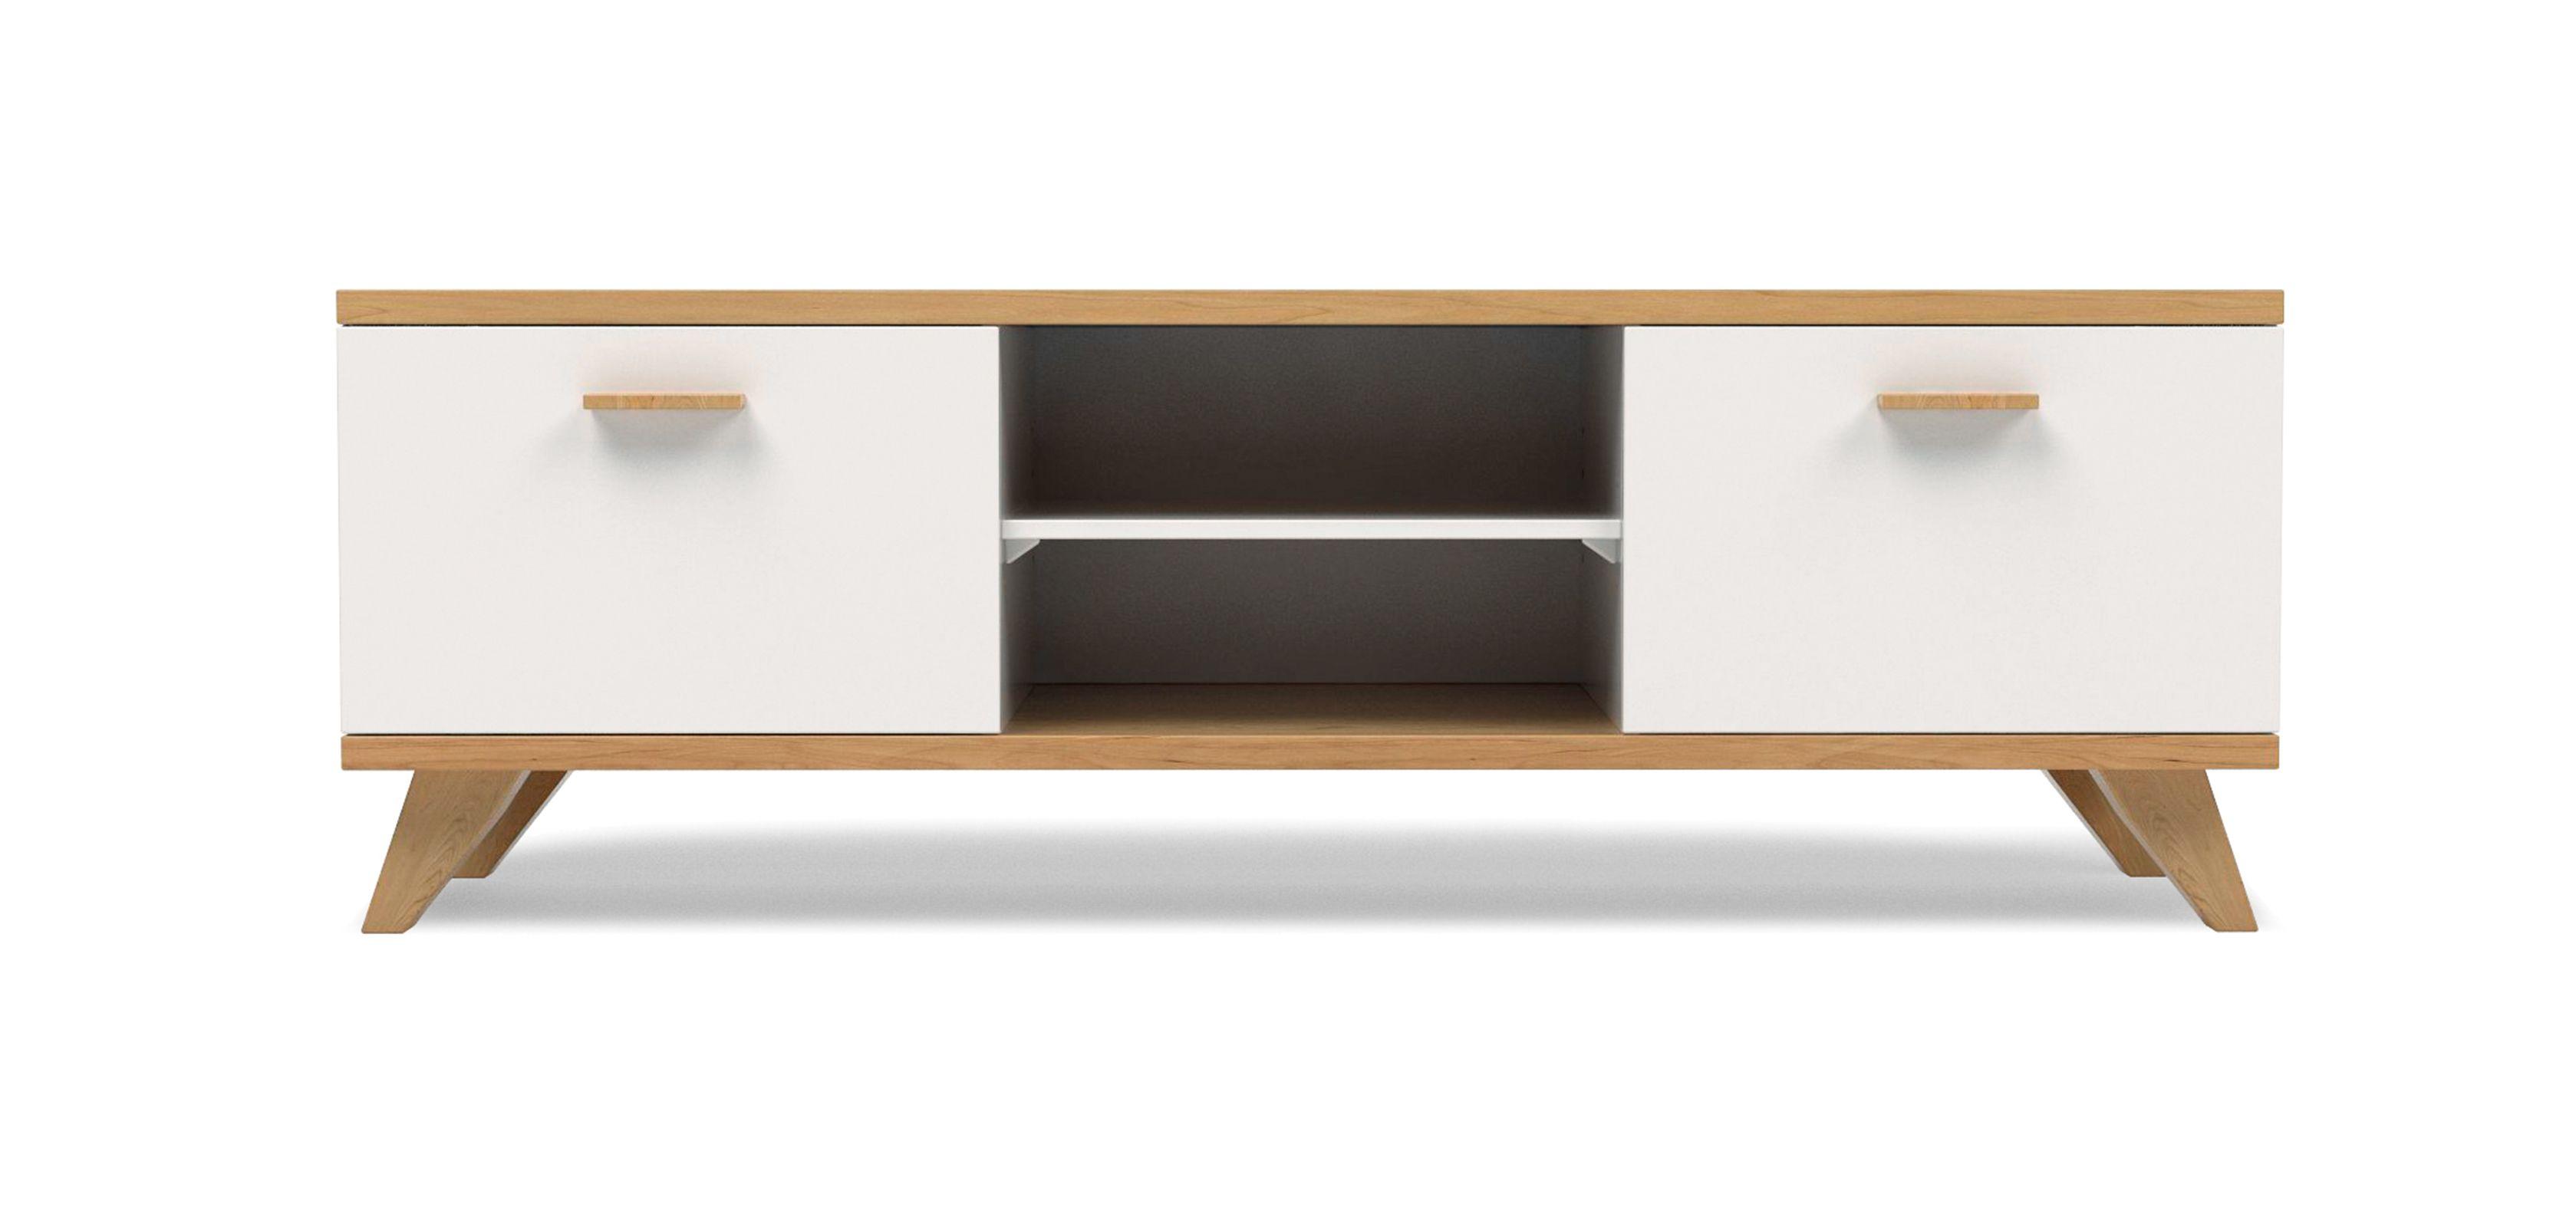 Meuble TV Style Scandinave Milow Bois idee meuble